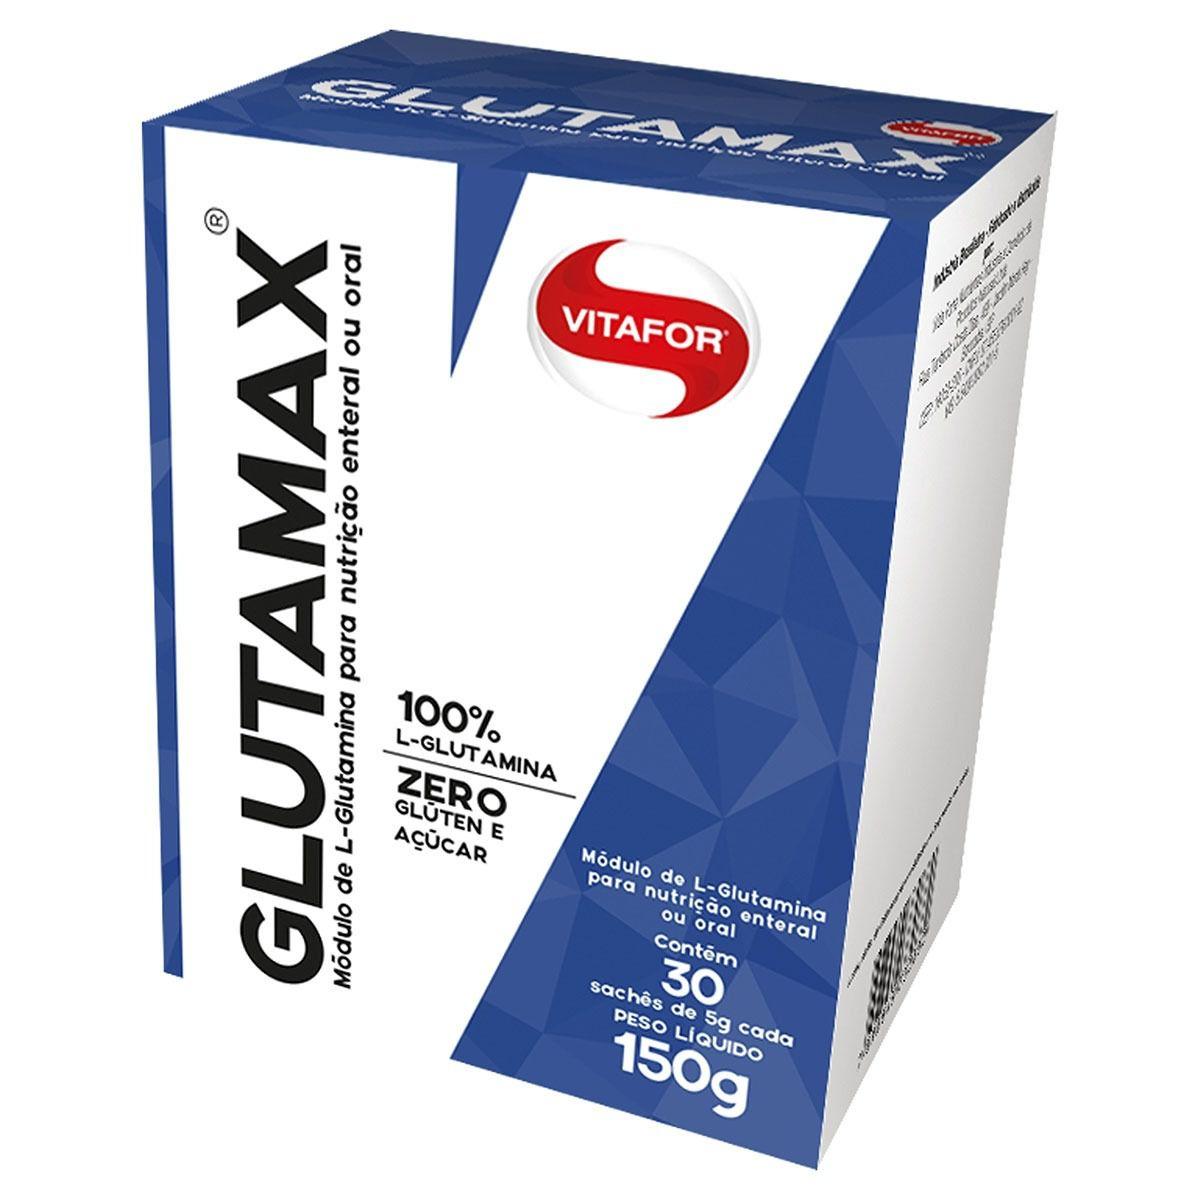 Caixa Glutamax 150g 100% L-glutamina 30 Sachês - Vitafor